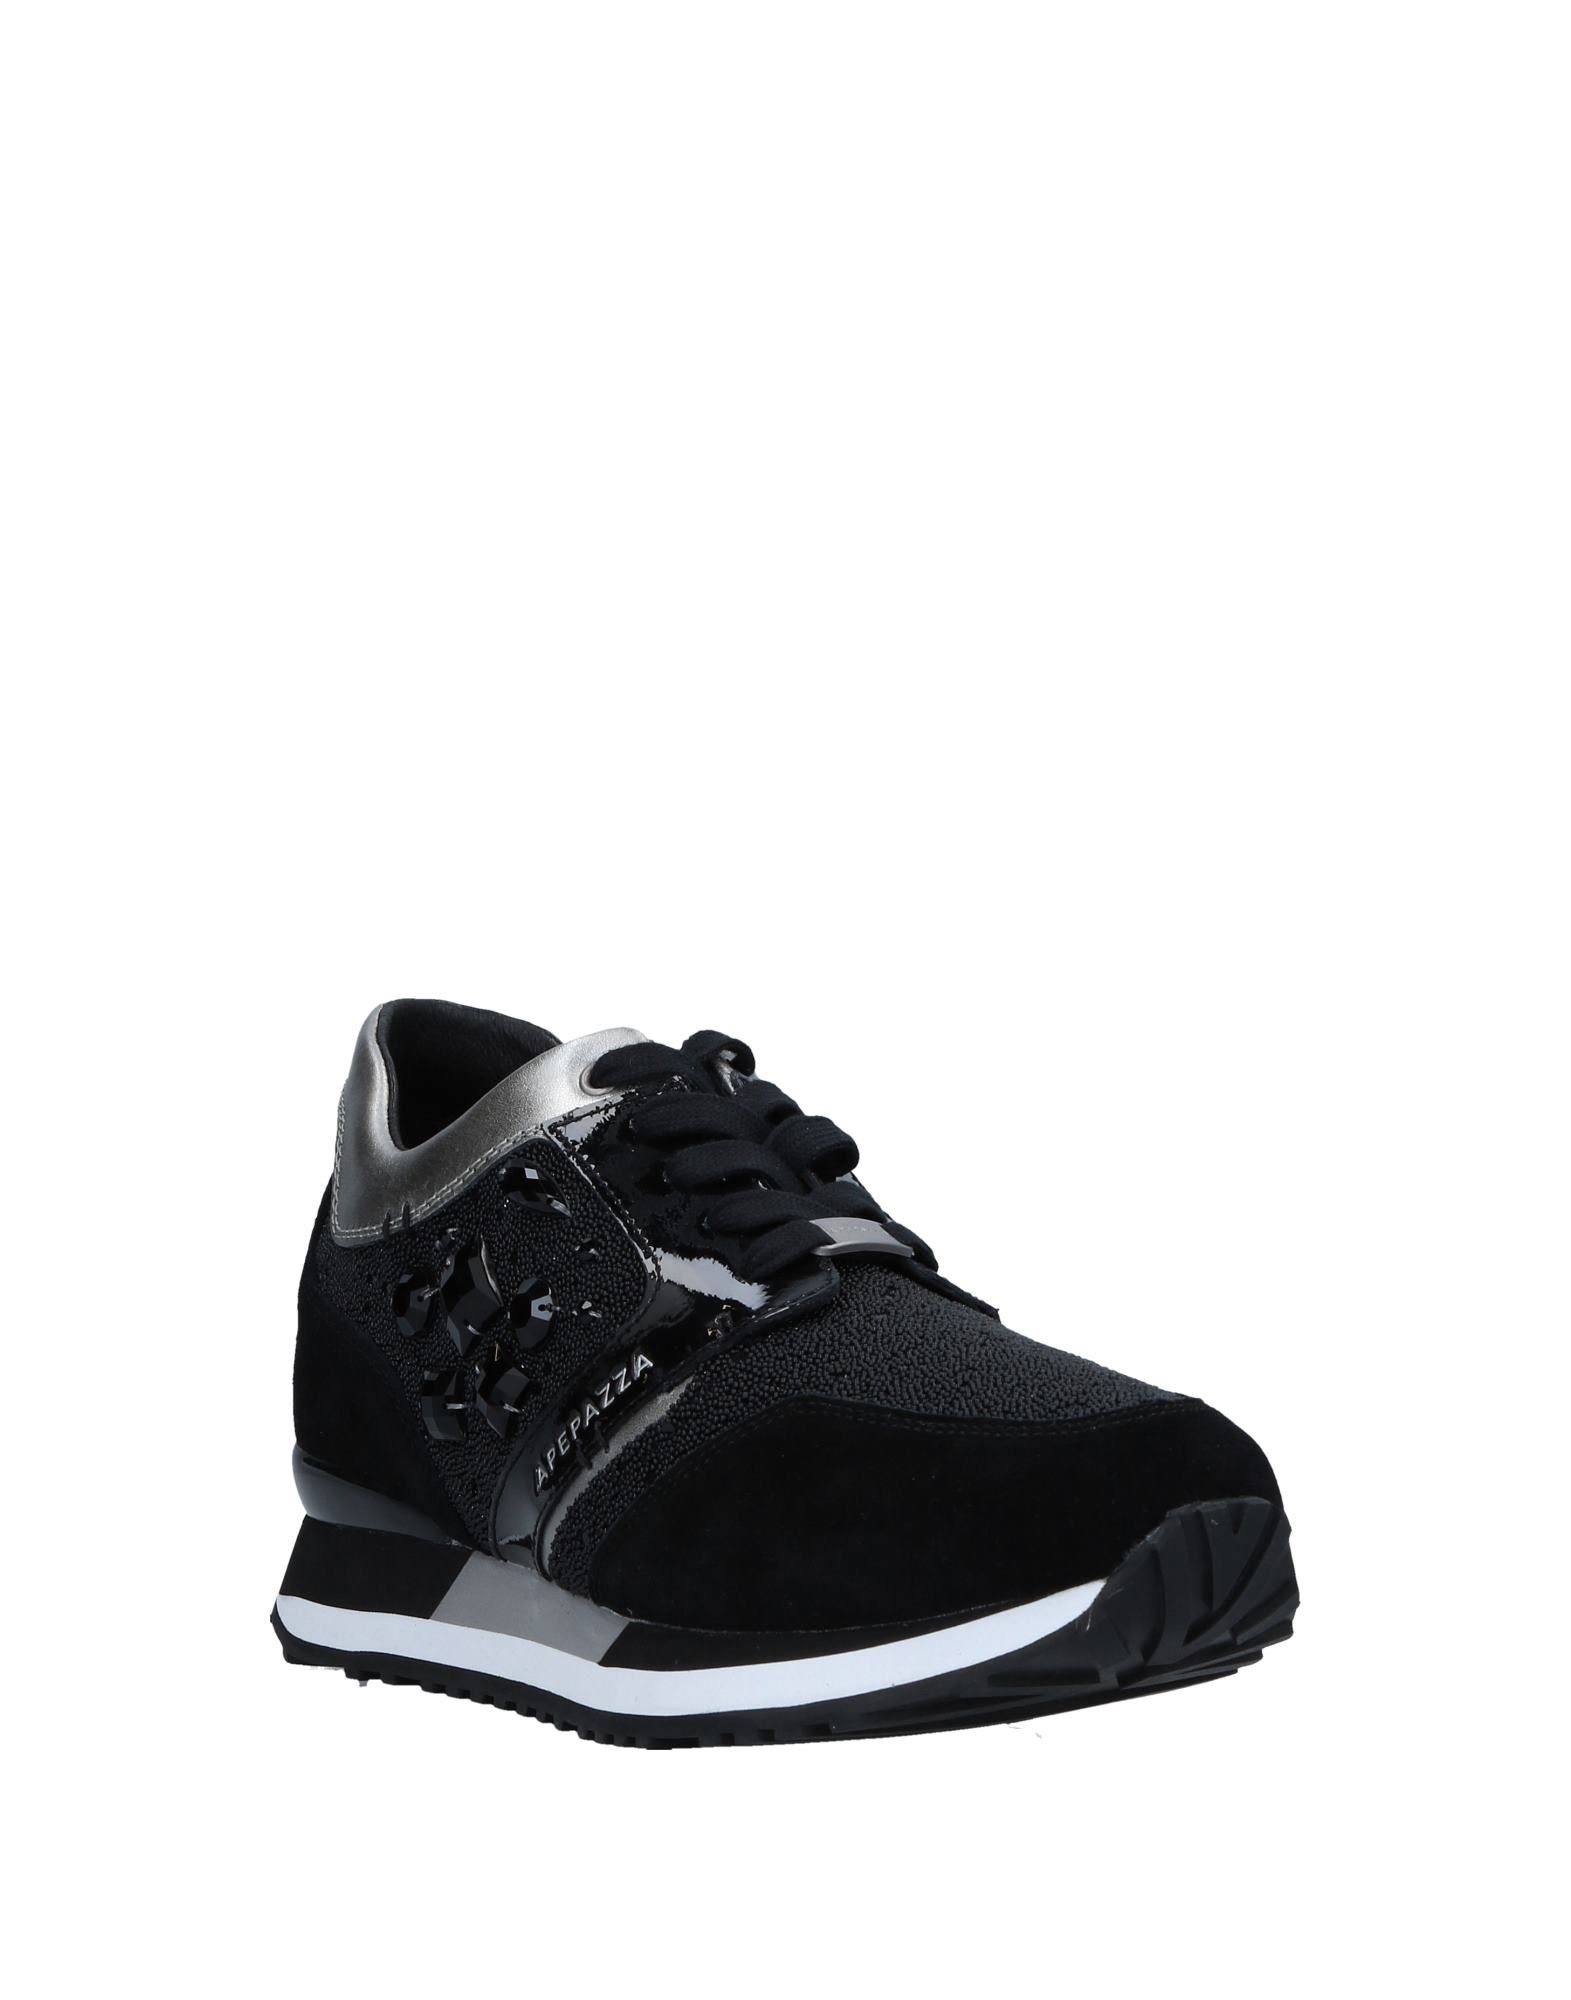 Apepazza Sneakers Damen Qualität  11534161WA Gute Qualität Damen beliebte Schuhe 98db3f